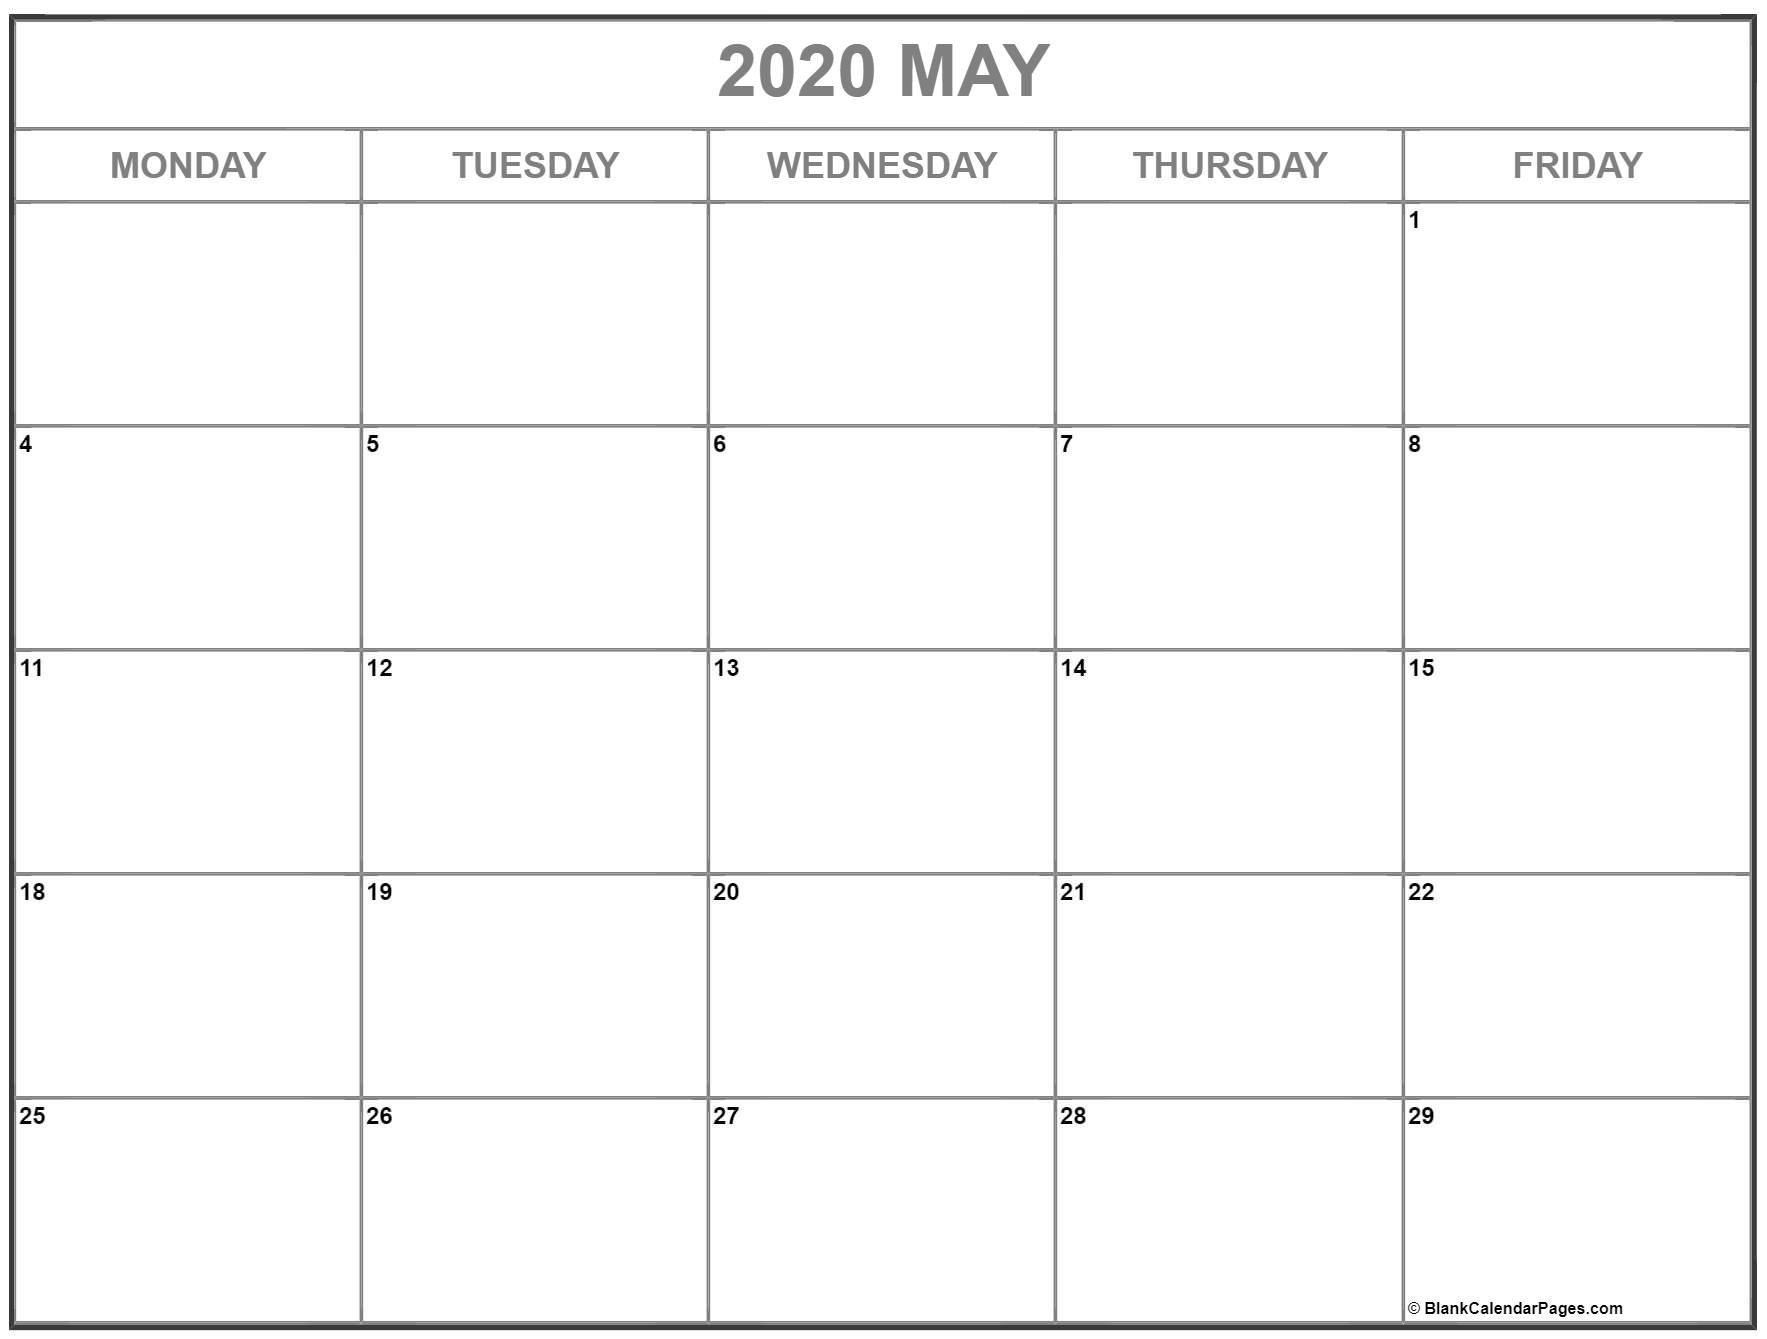 May 2020 Monday Calendar | Monday To Sunday Free Printable Monday-Friday Calendar